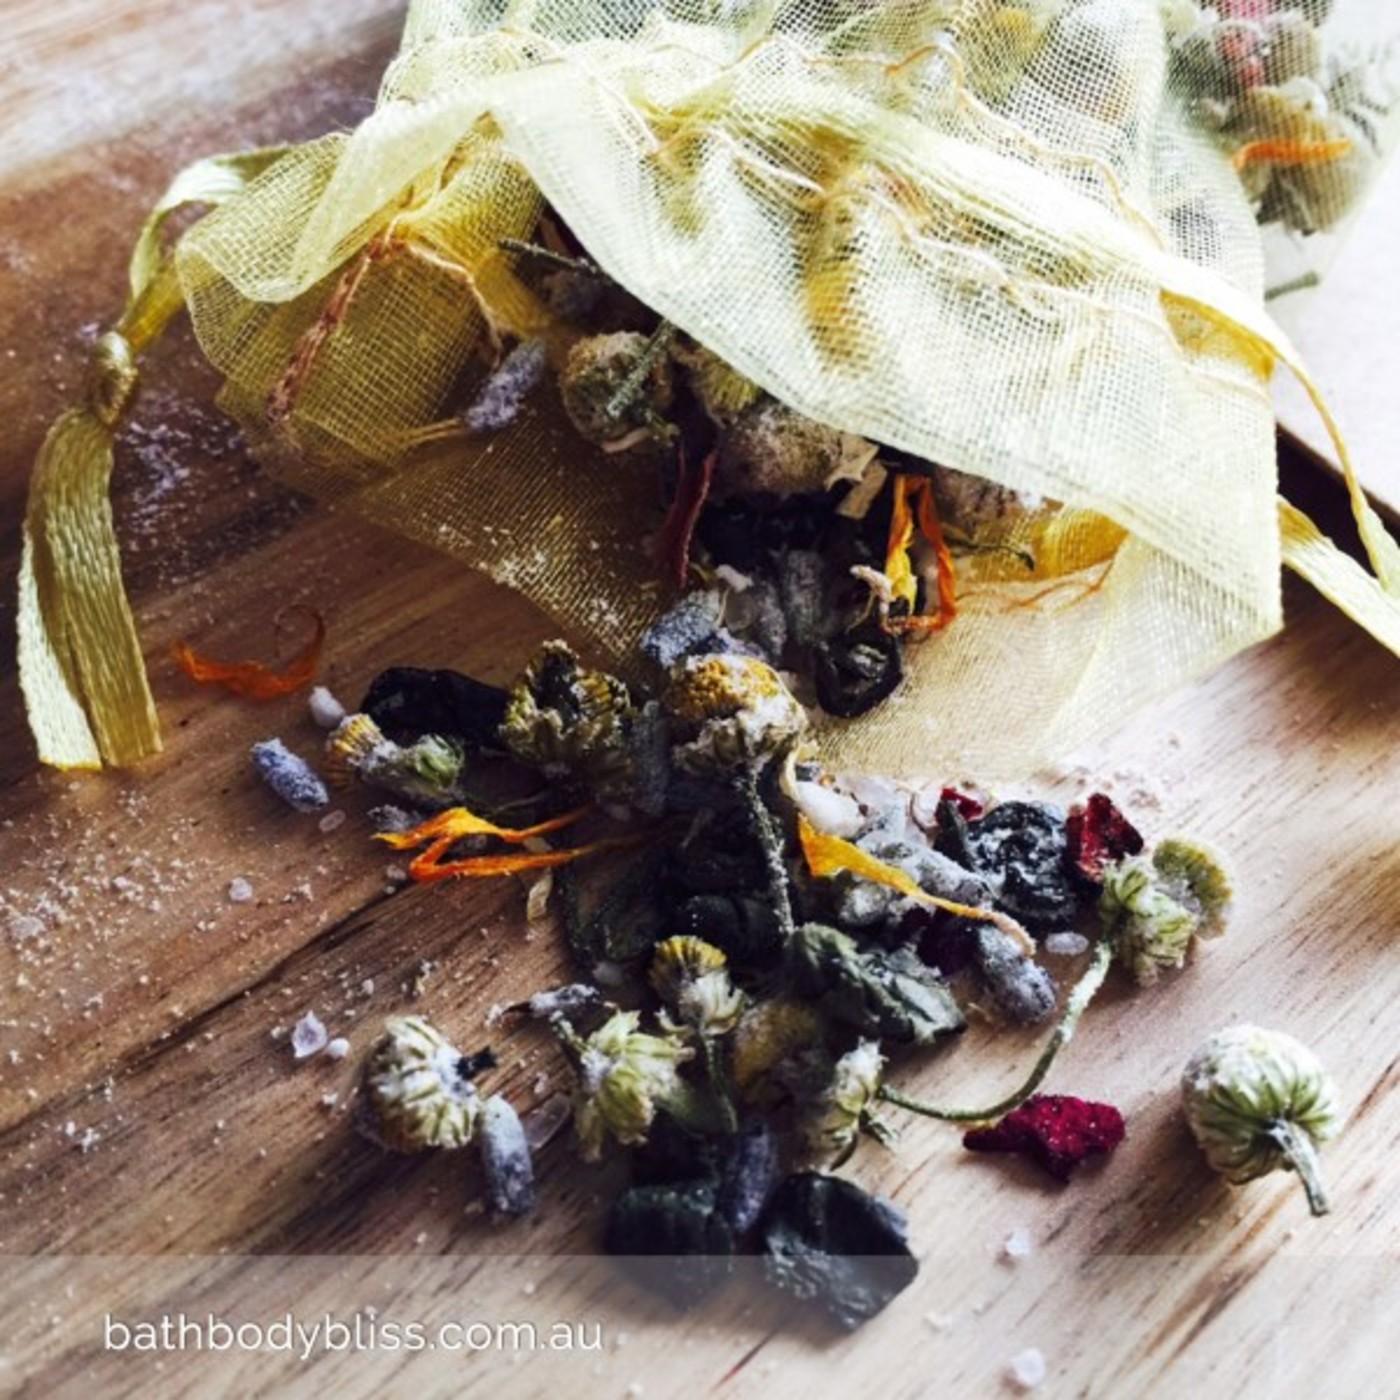 Tub Tea Bath Soak Salts 1 Bath Pk With Lavender